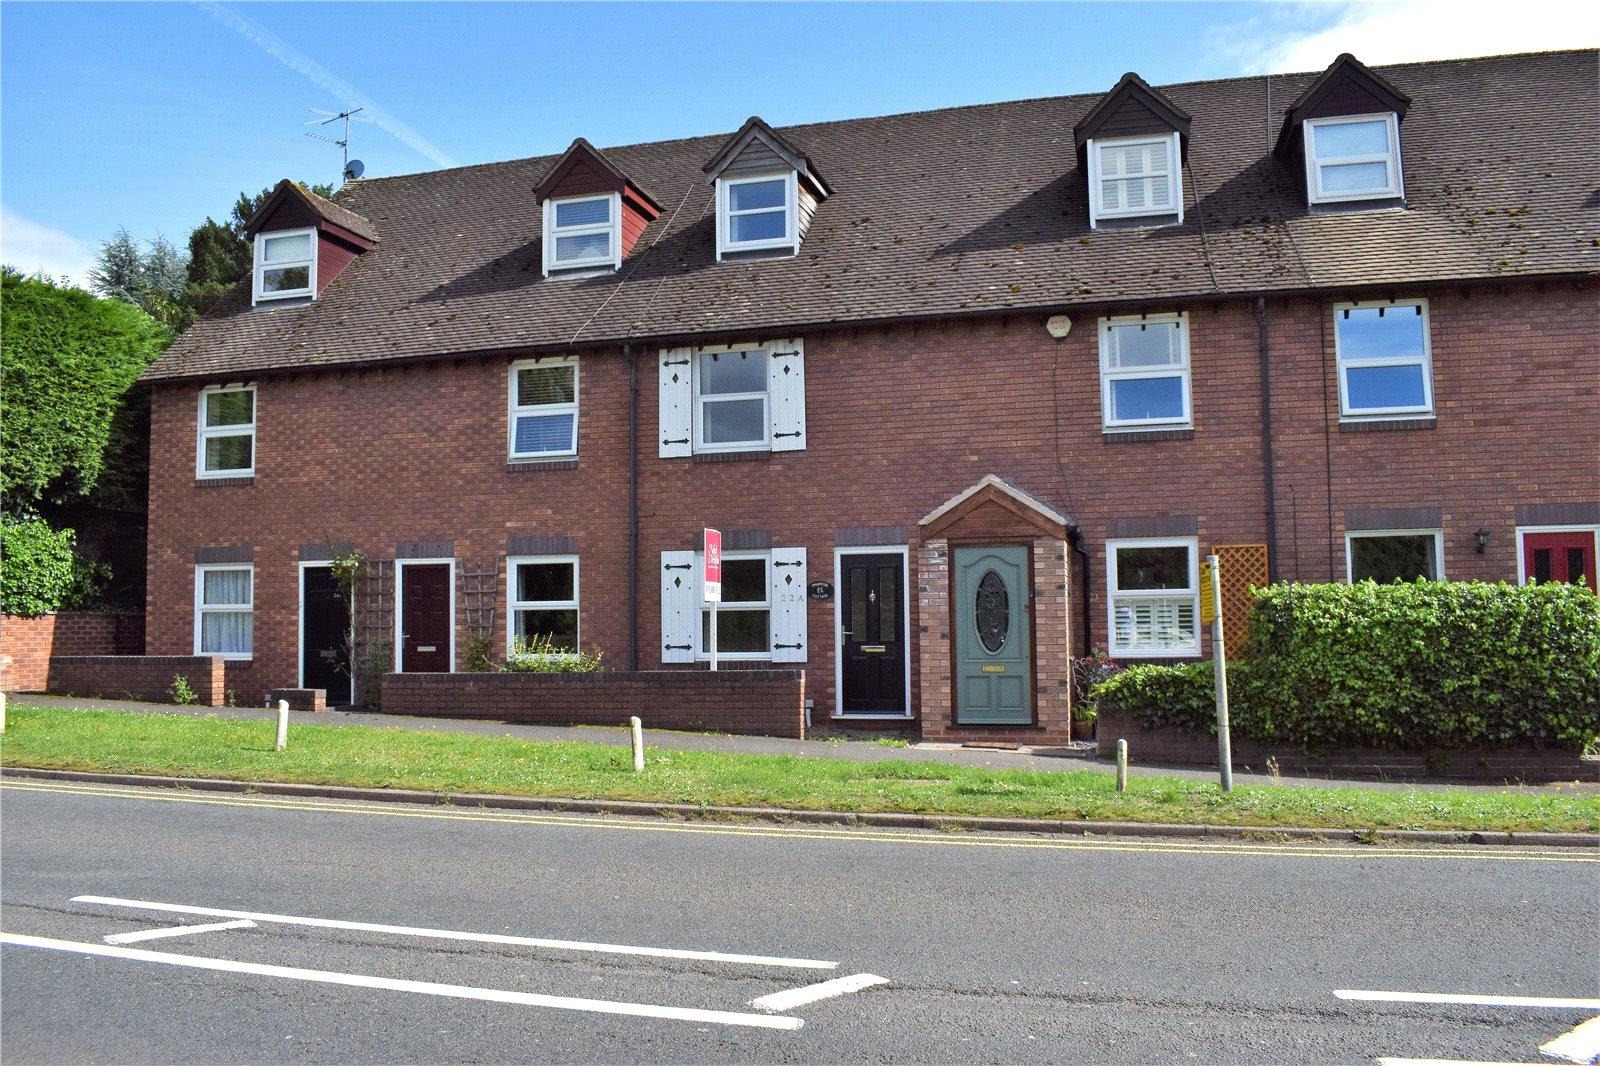 23a Mill Street, Bridgnorth, Shropshire, WV15